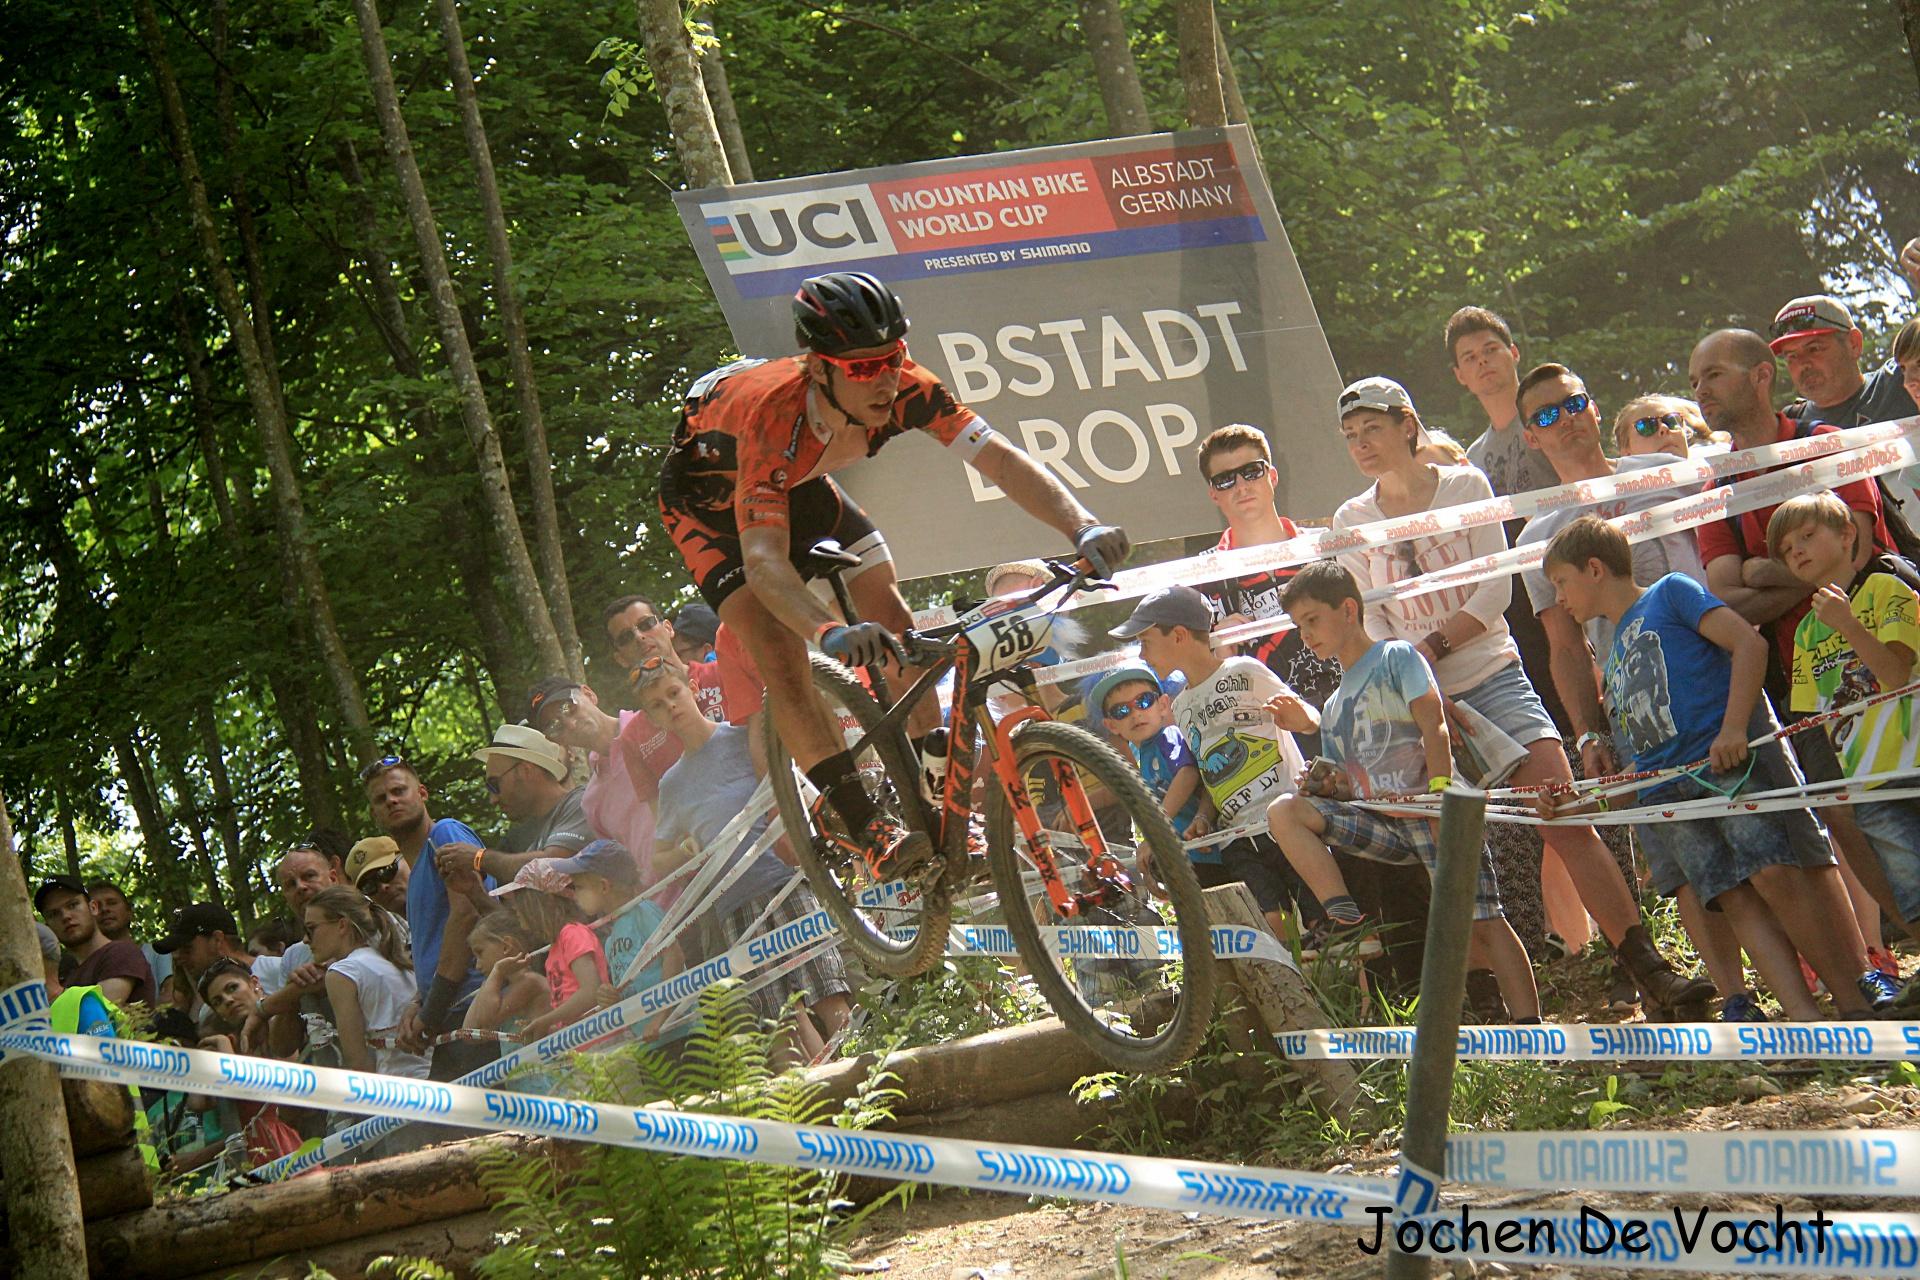 KTM Bikevision bikers blikken terug op wereldbeker Albstadt